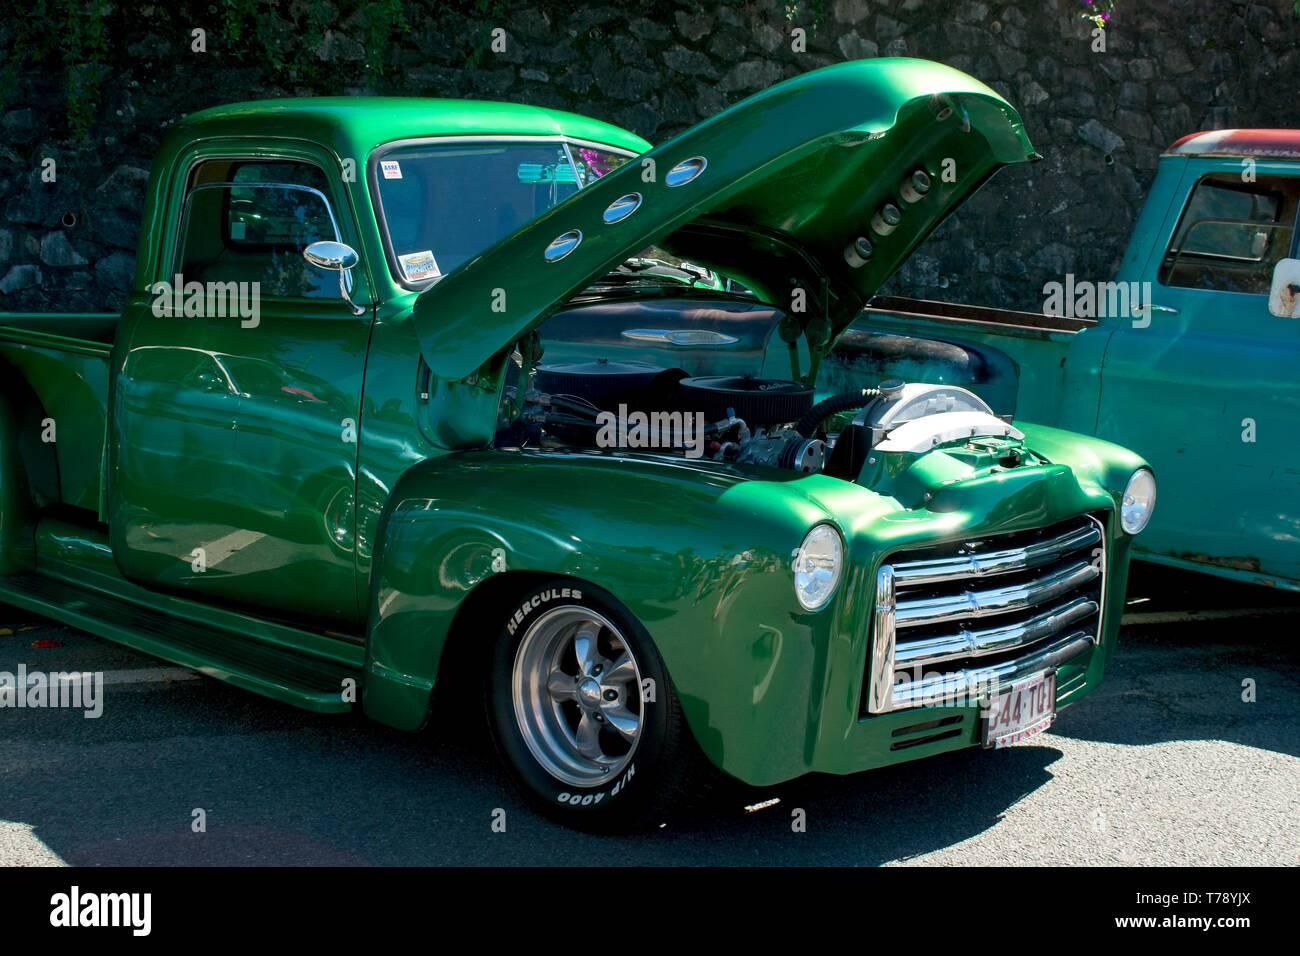 Palmview, Queensland, Australia - 5 de mayo de 2019: camioneta GMC 1950. Foto de stock